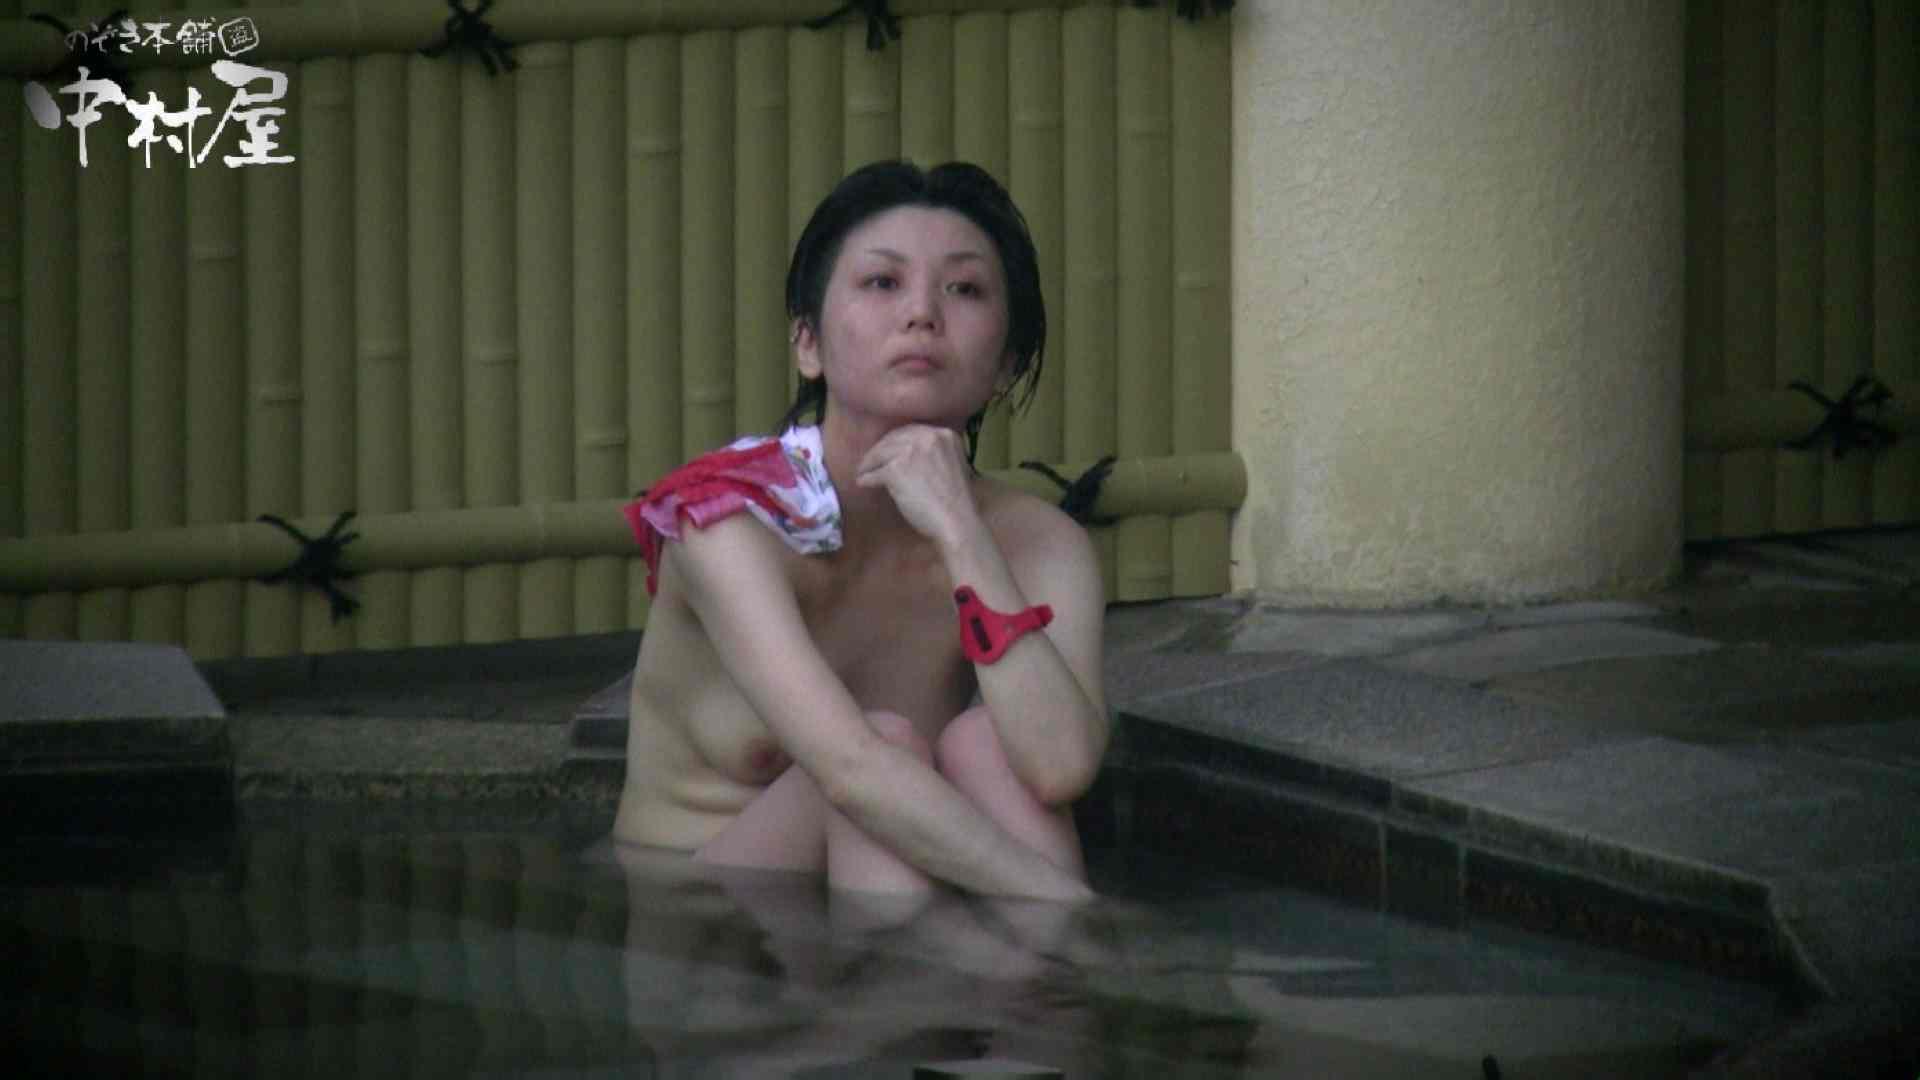 Aquaな露天風呂Vol.884 盗撮 AV無料 80枚 77